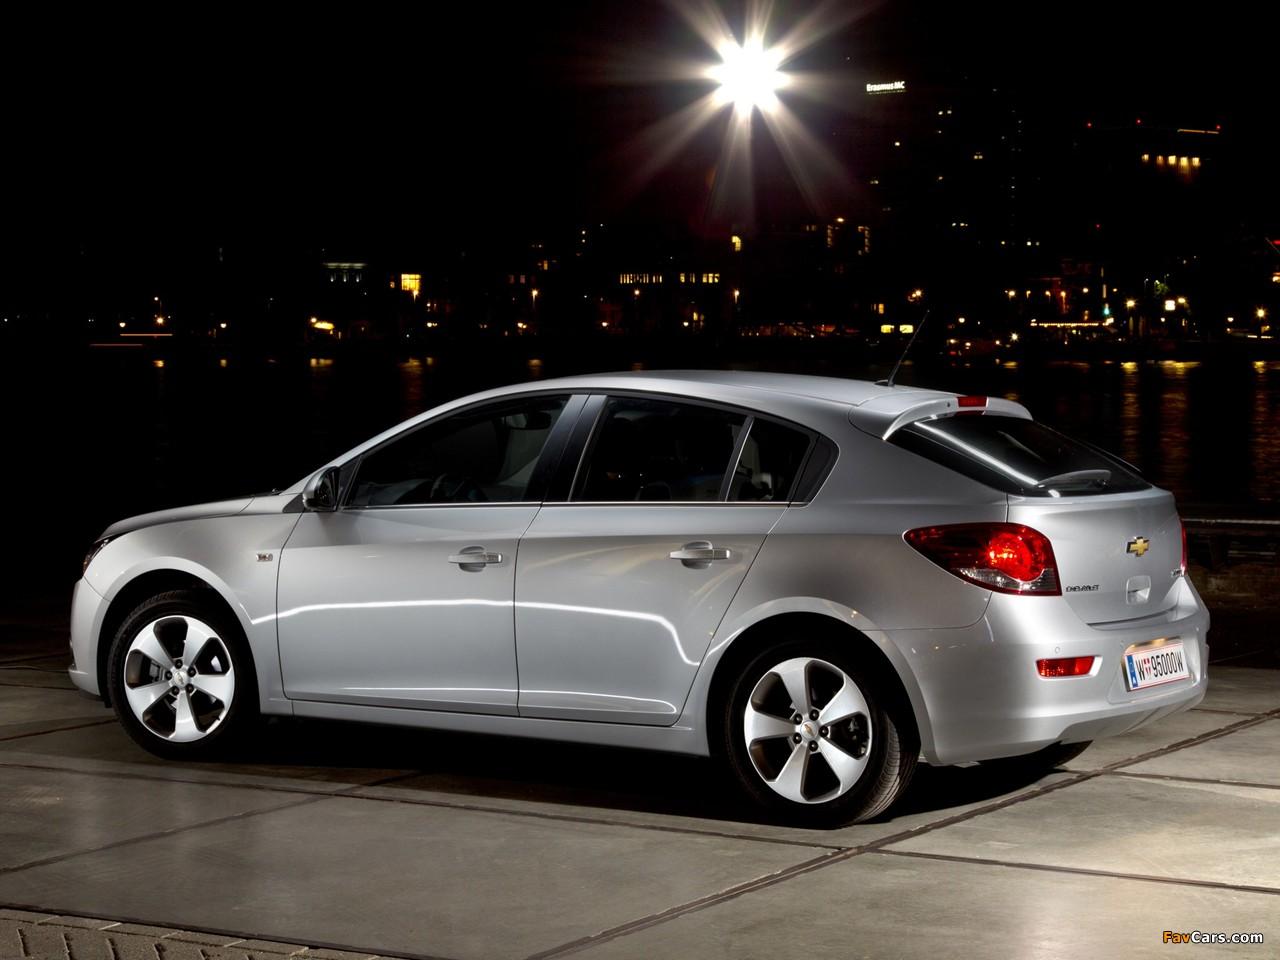 Chevrolet Cruze Hatchback (J300) 2011–12 photos (1280 x 960)